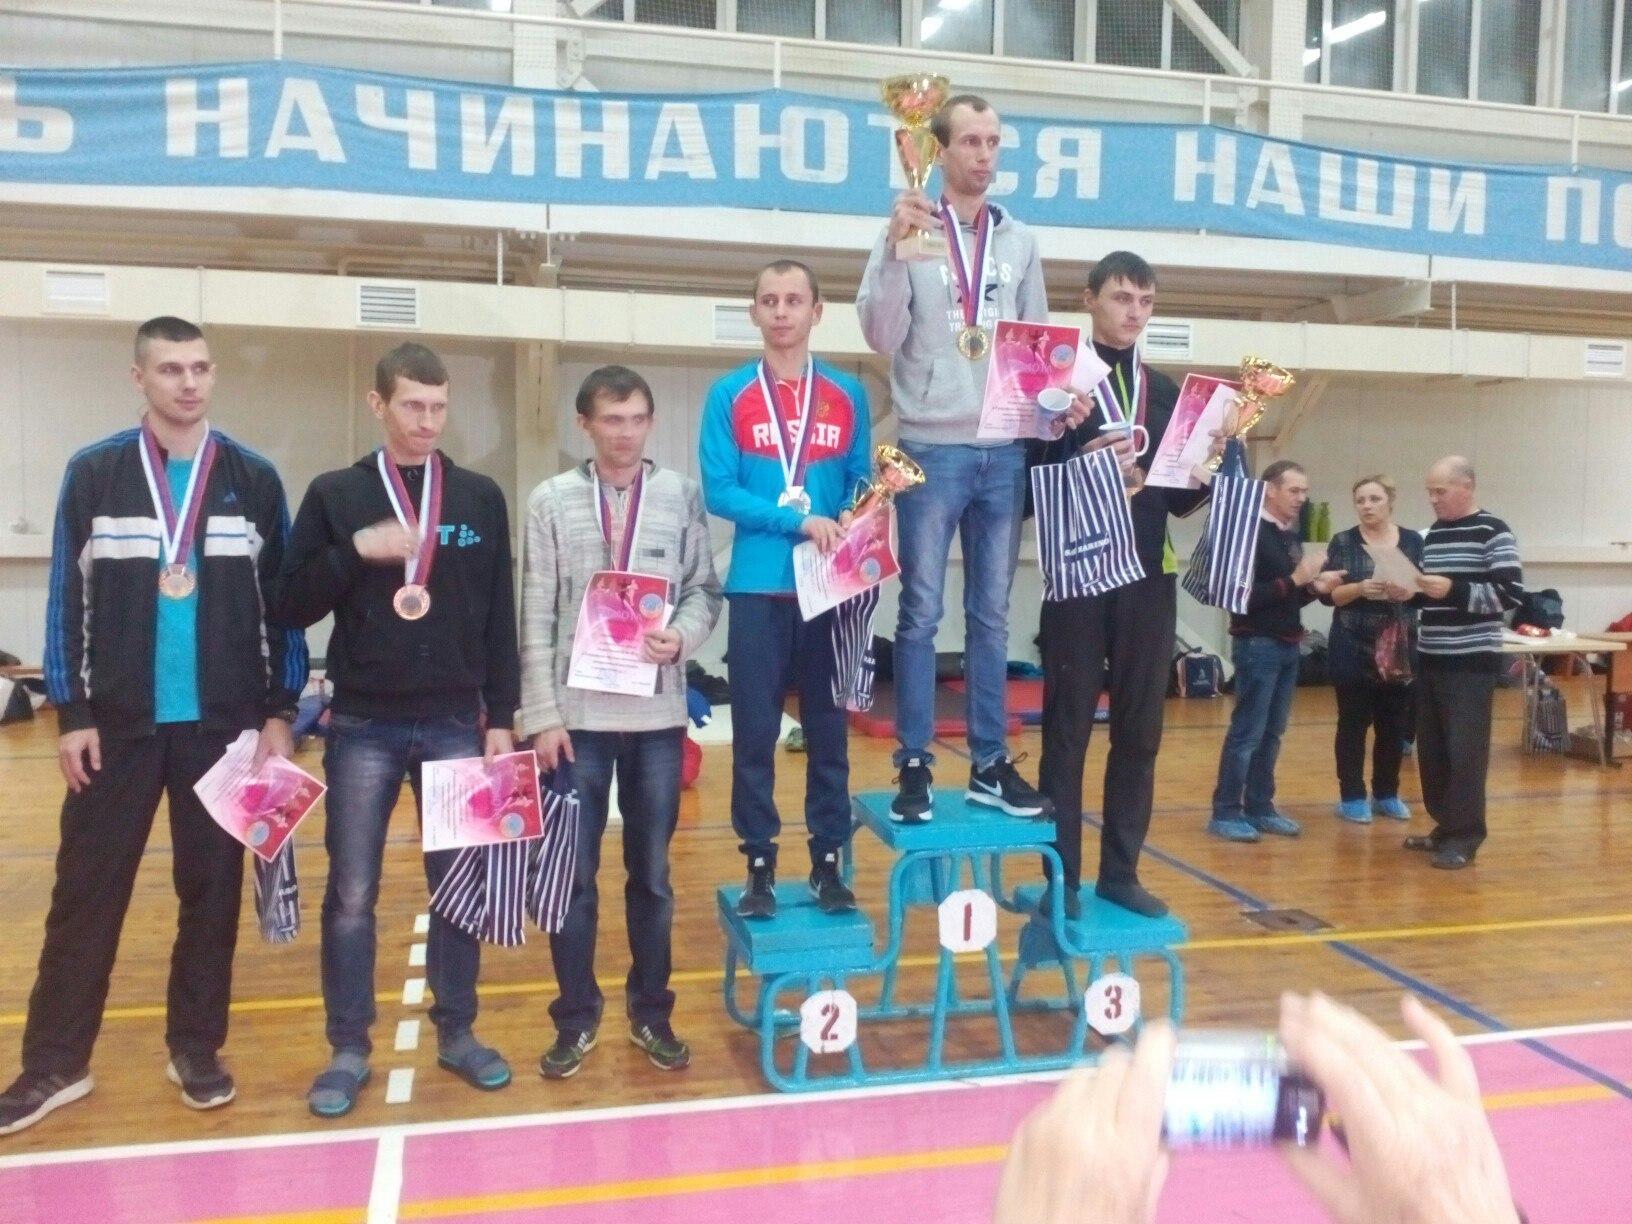 Отчет о марафоне «Мучкап-Шапкино-Любо!» 2016. Результат 2.37.50